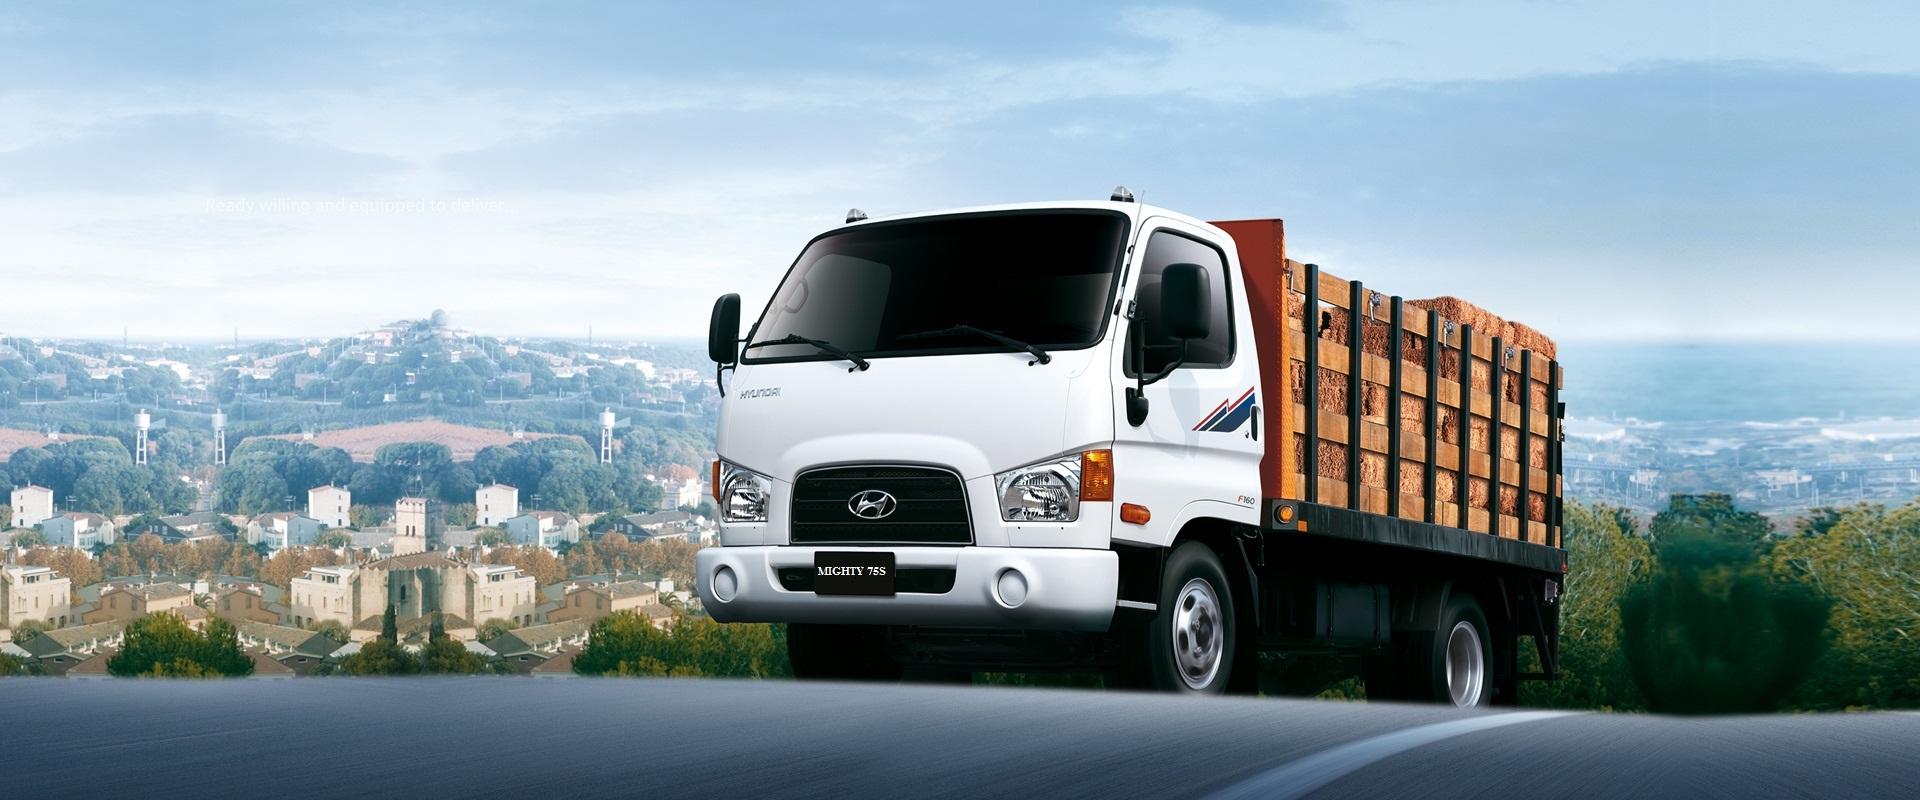 Hyundai New Mighty 75S 3.5 tan